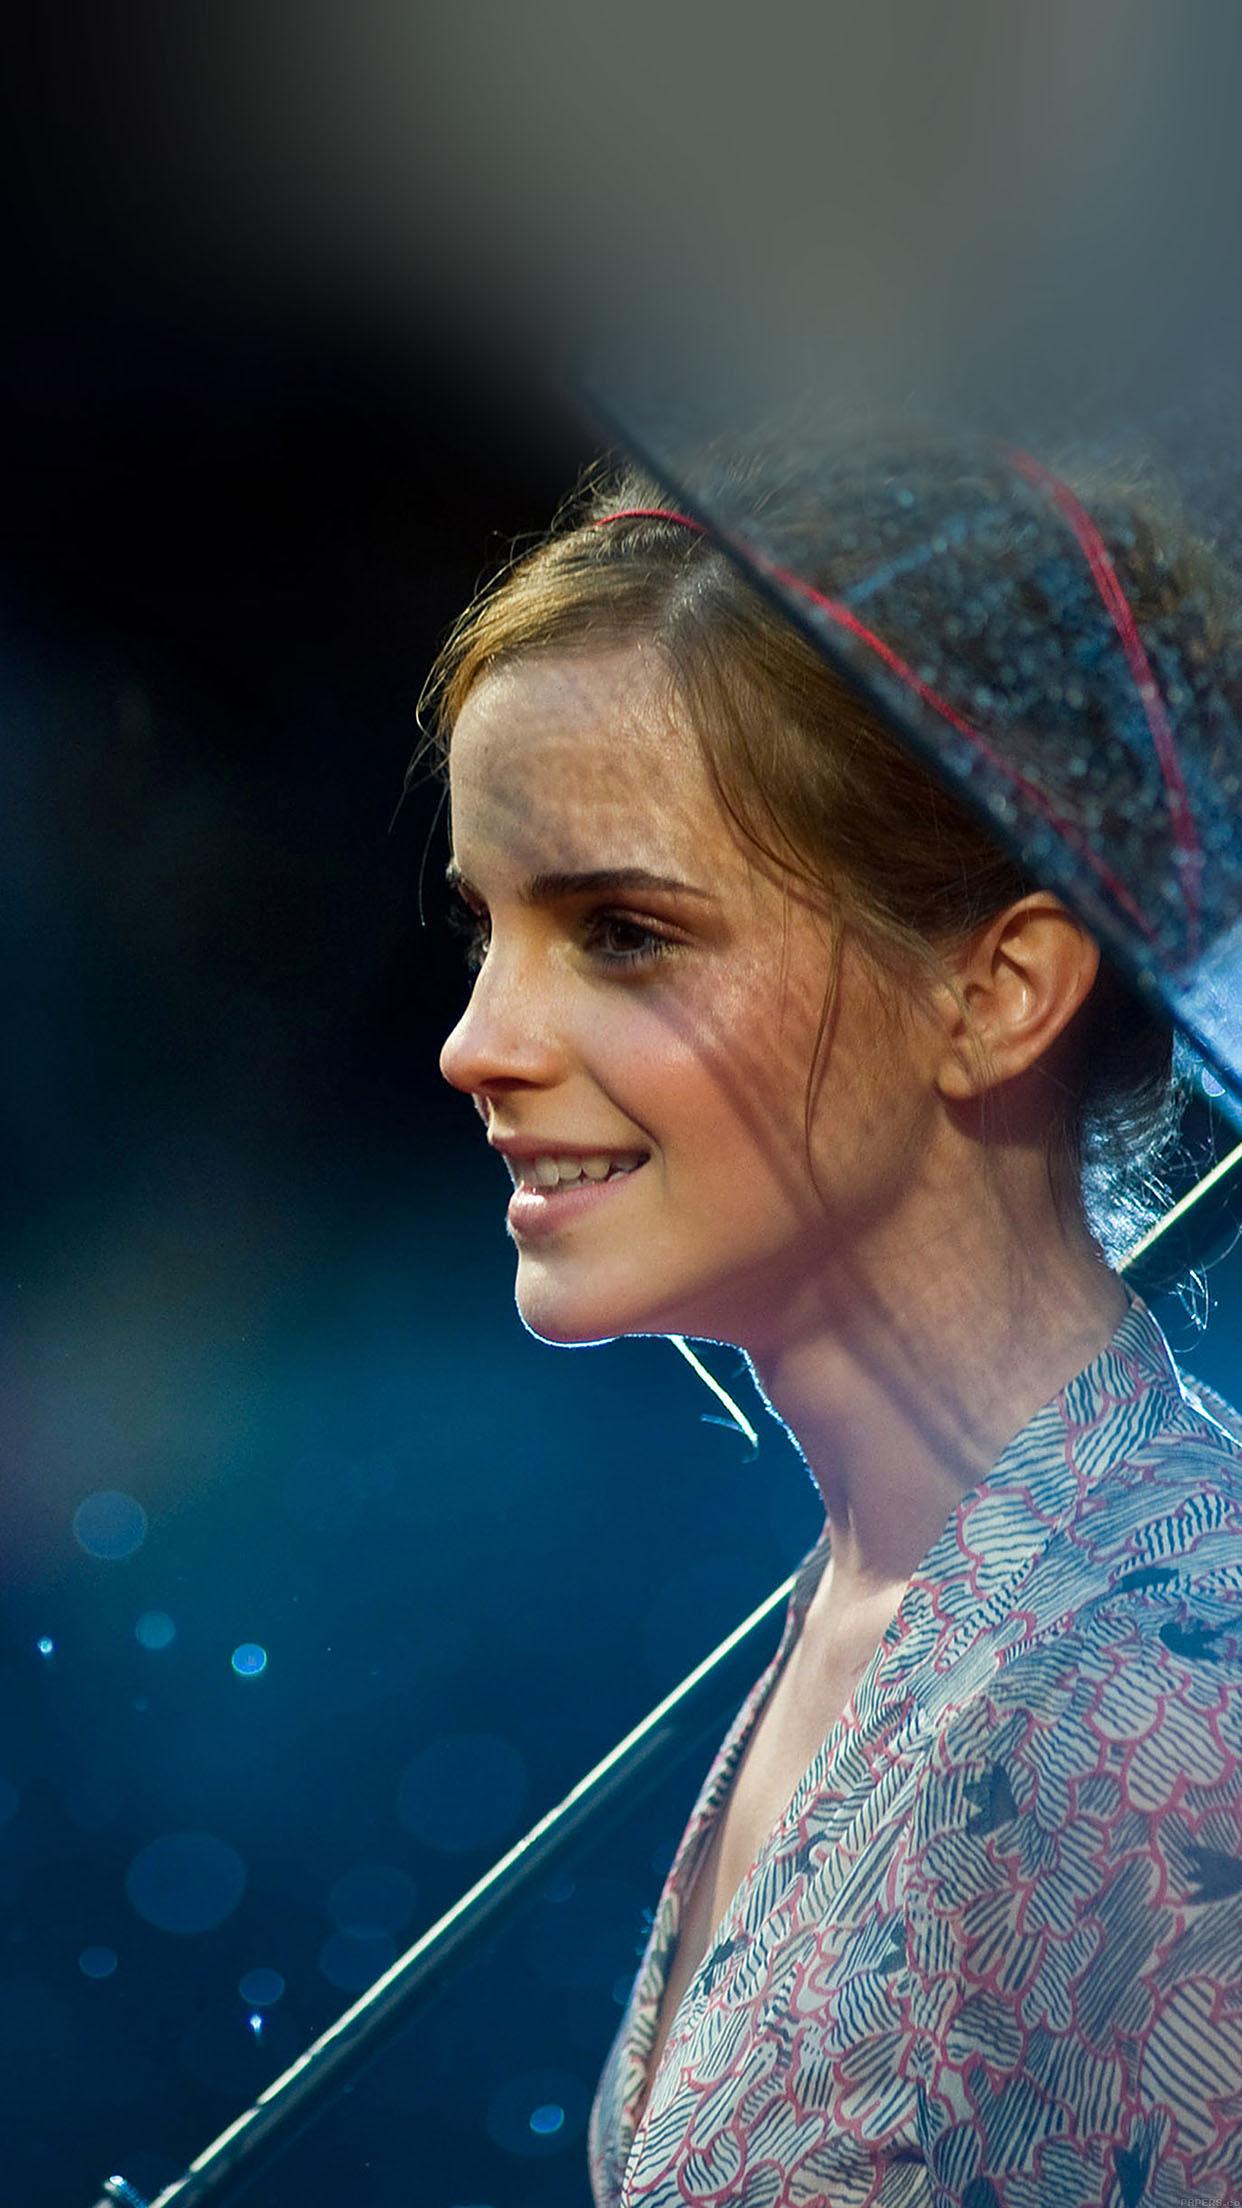 I Love Papers Ha55 Wallpaper Emma Watson In Rain Girl Film Face